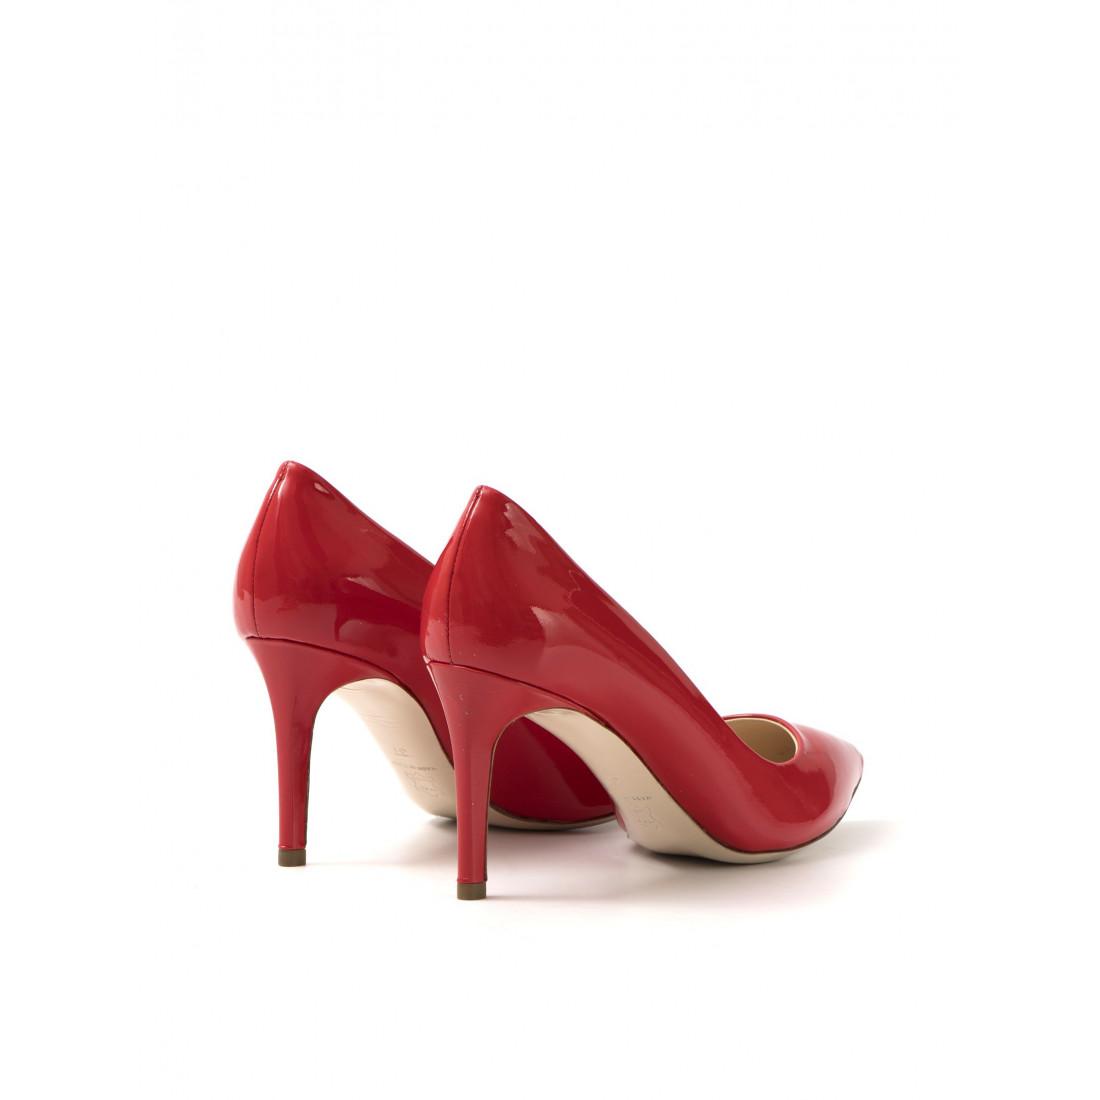 pumps woman capitini 04 paola 80 vernflamingo 615